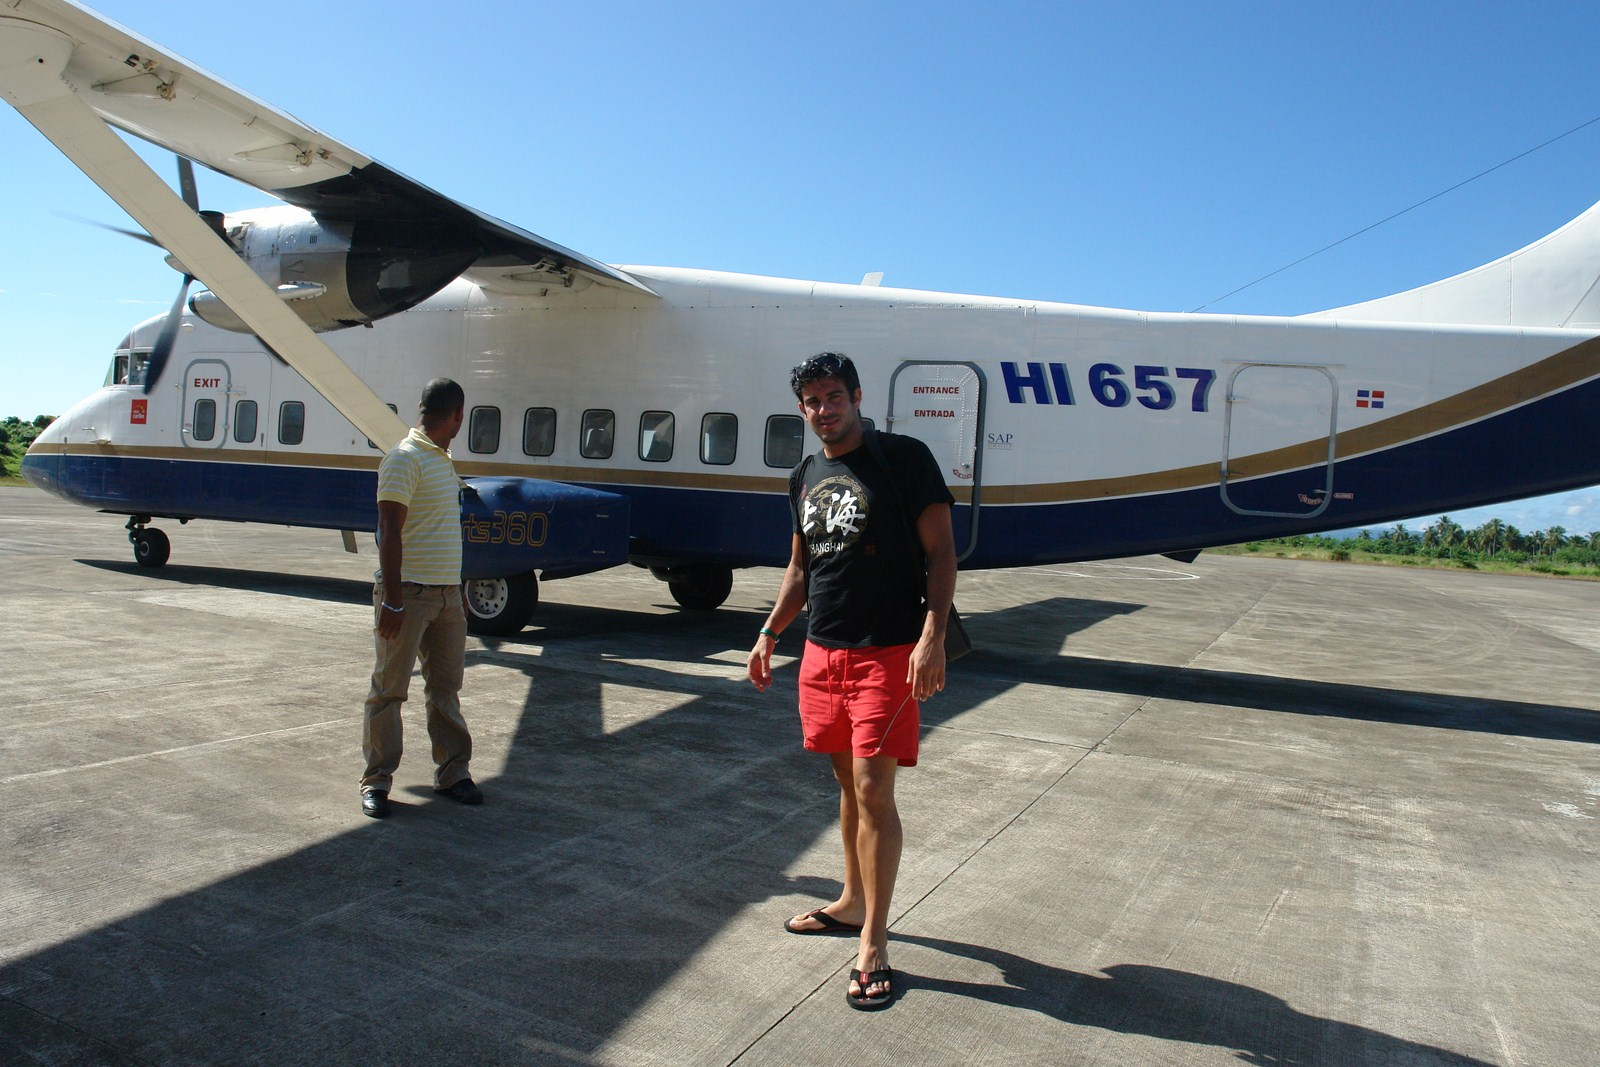 Vuelo de vértigo en República Dominicana Historias de aeropuertos - 14957455621 901ff9fece o - Historias de aeropuertos